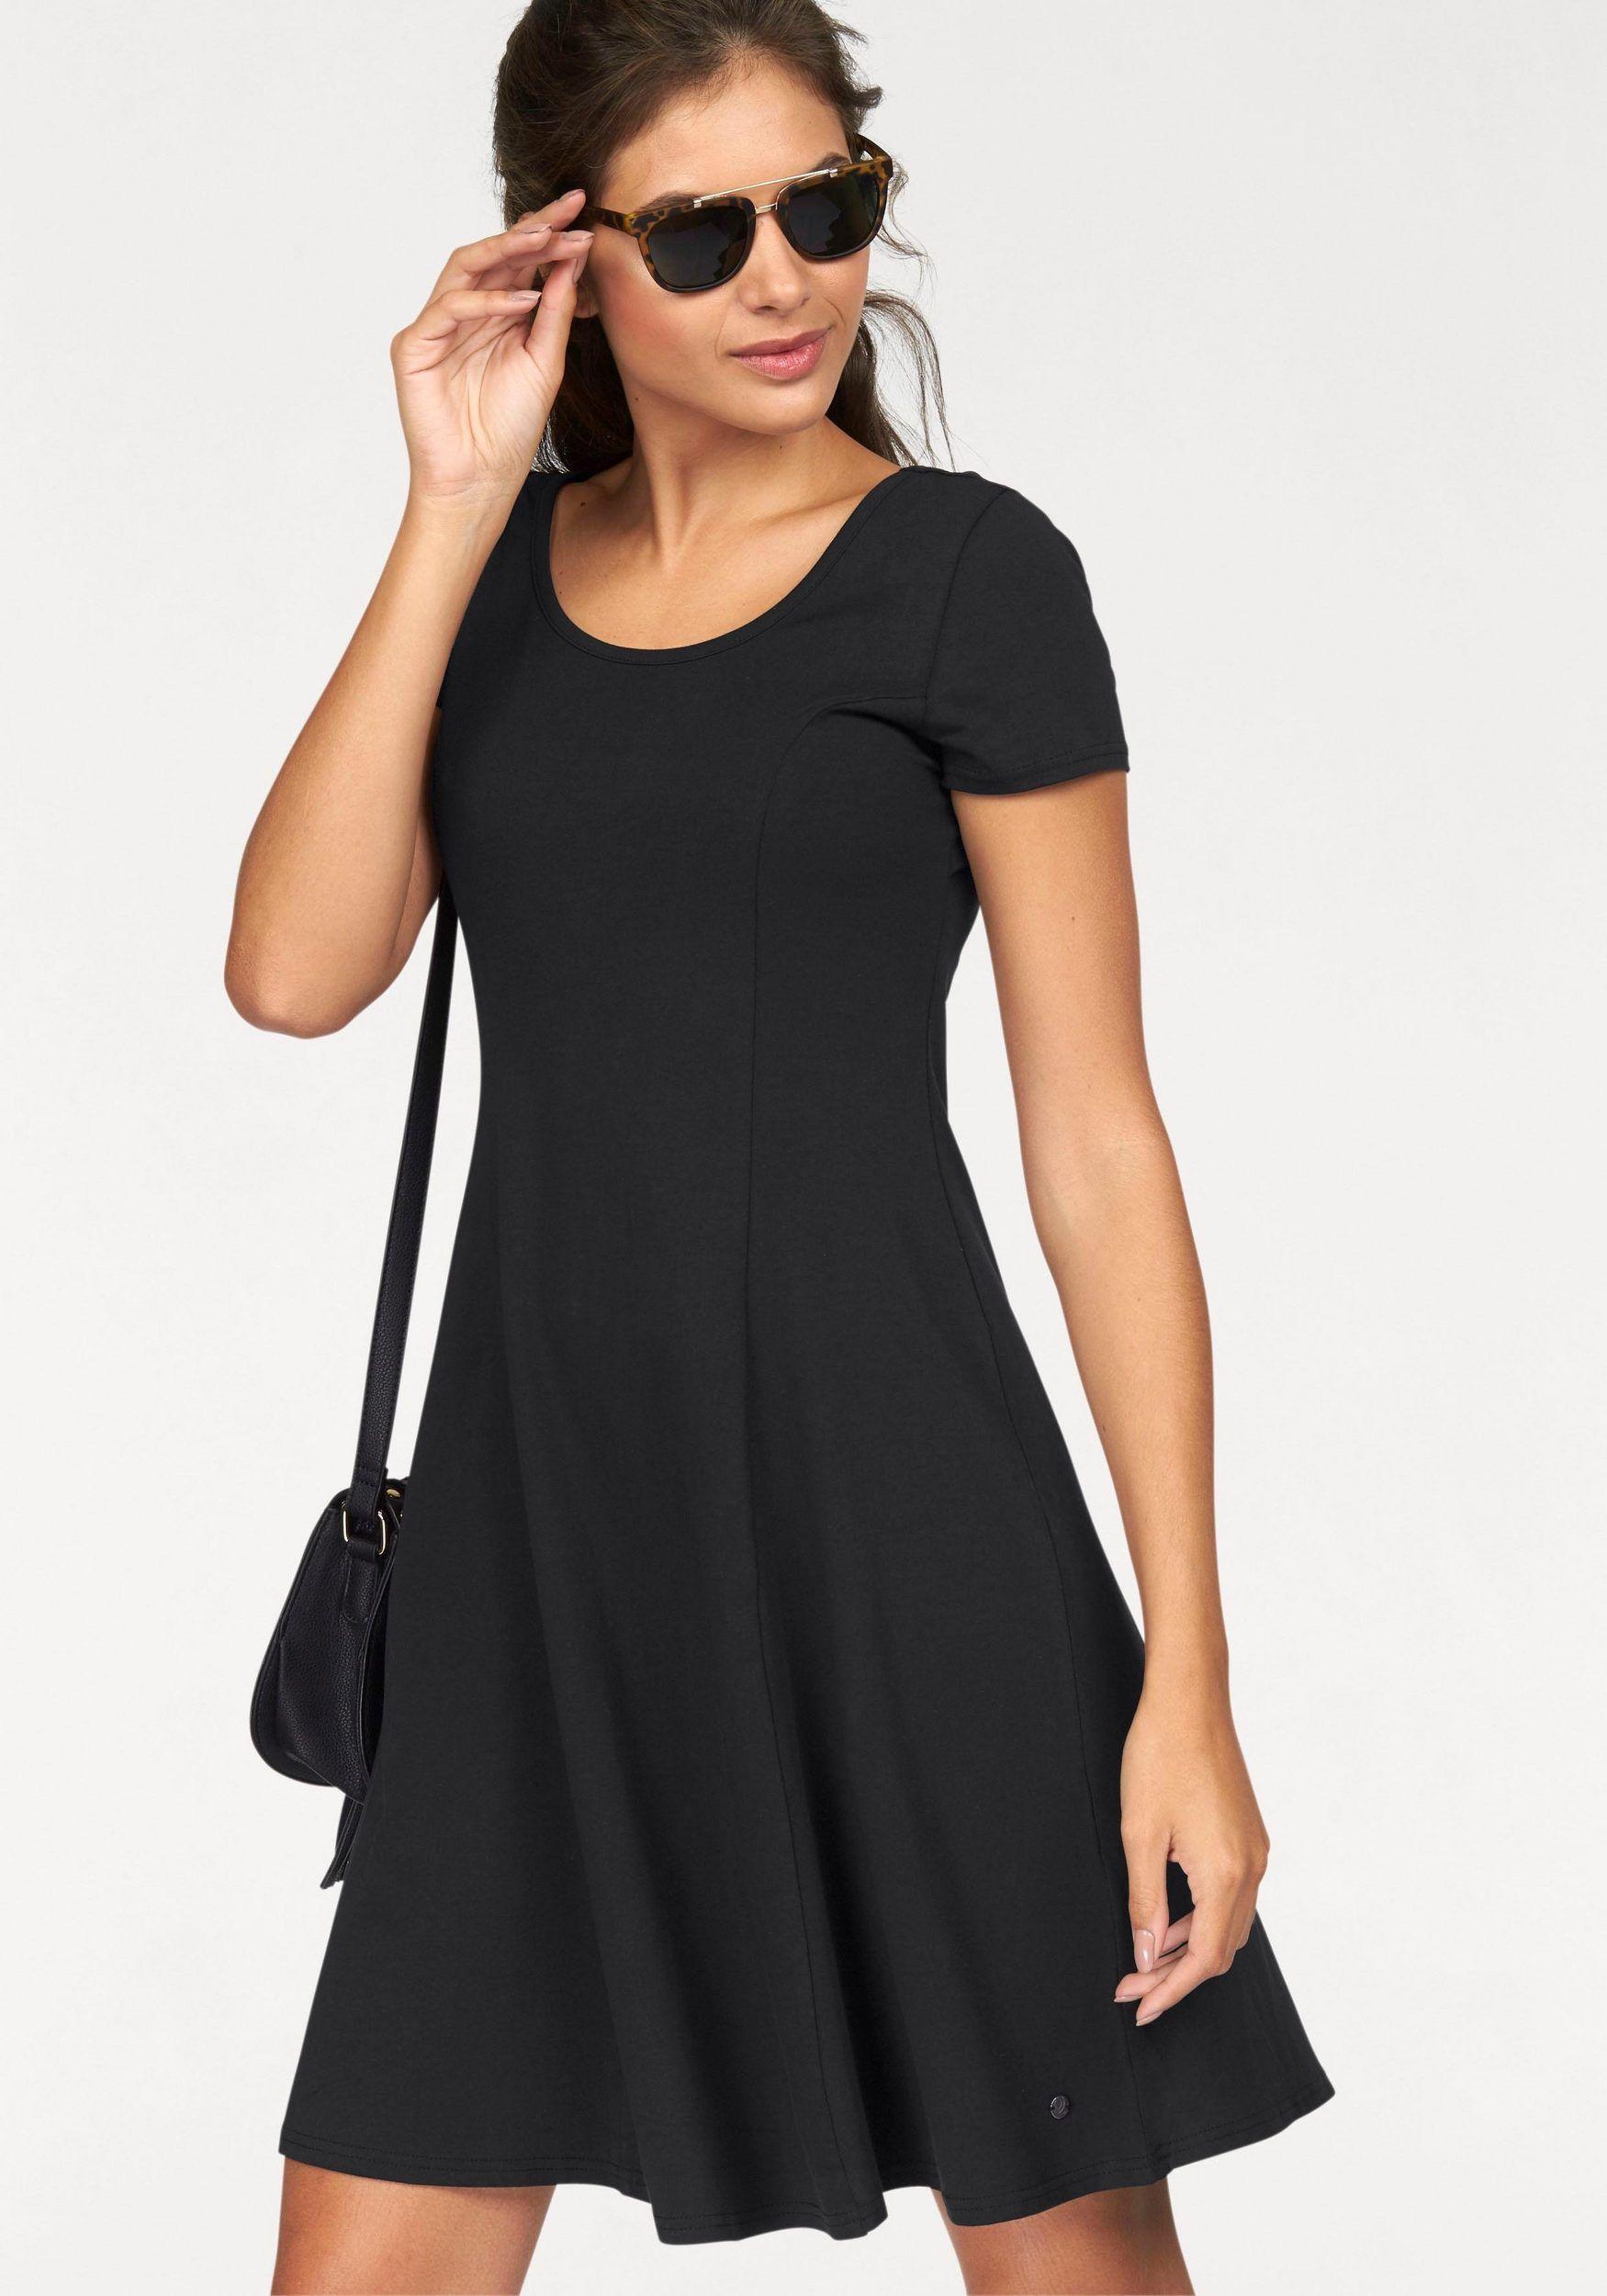 Kleid a linien form